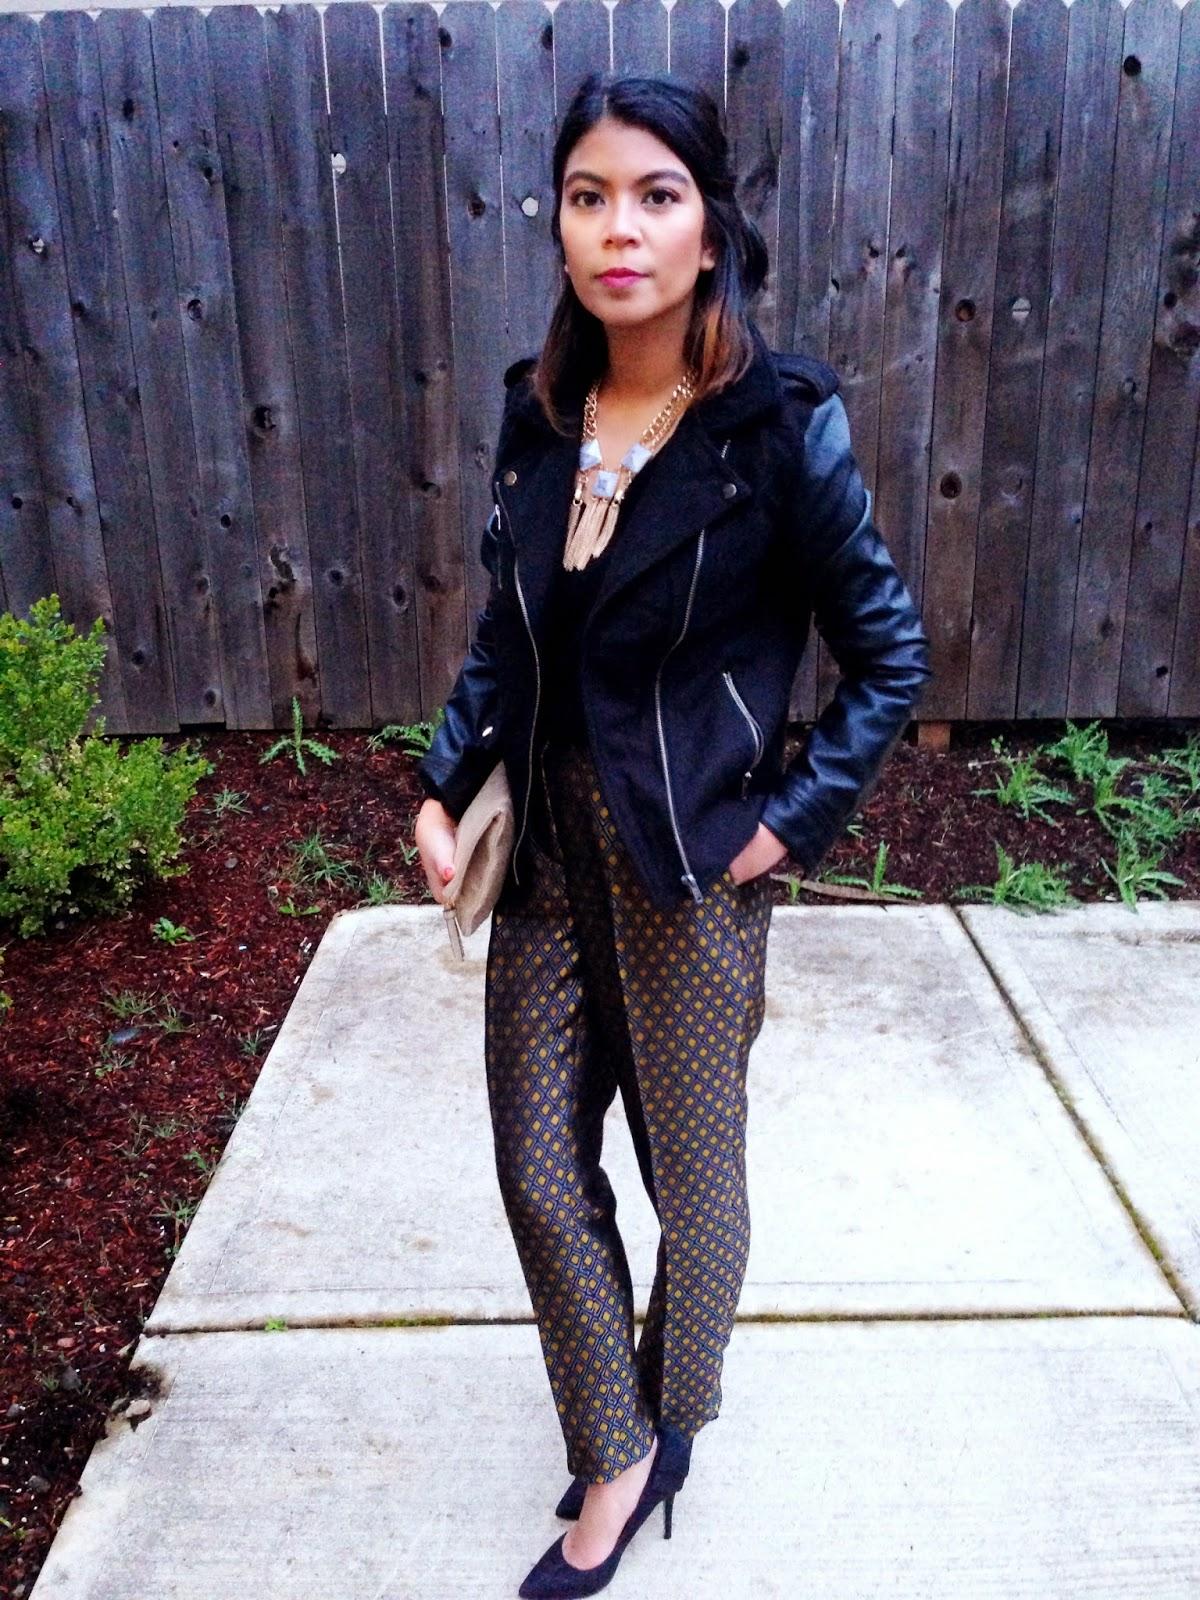 jacquard, fashion blogger, ptowngirls, lucky fabb